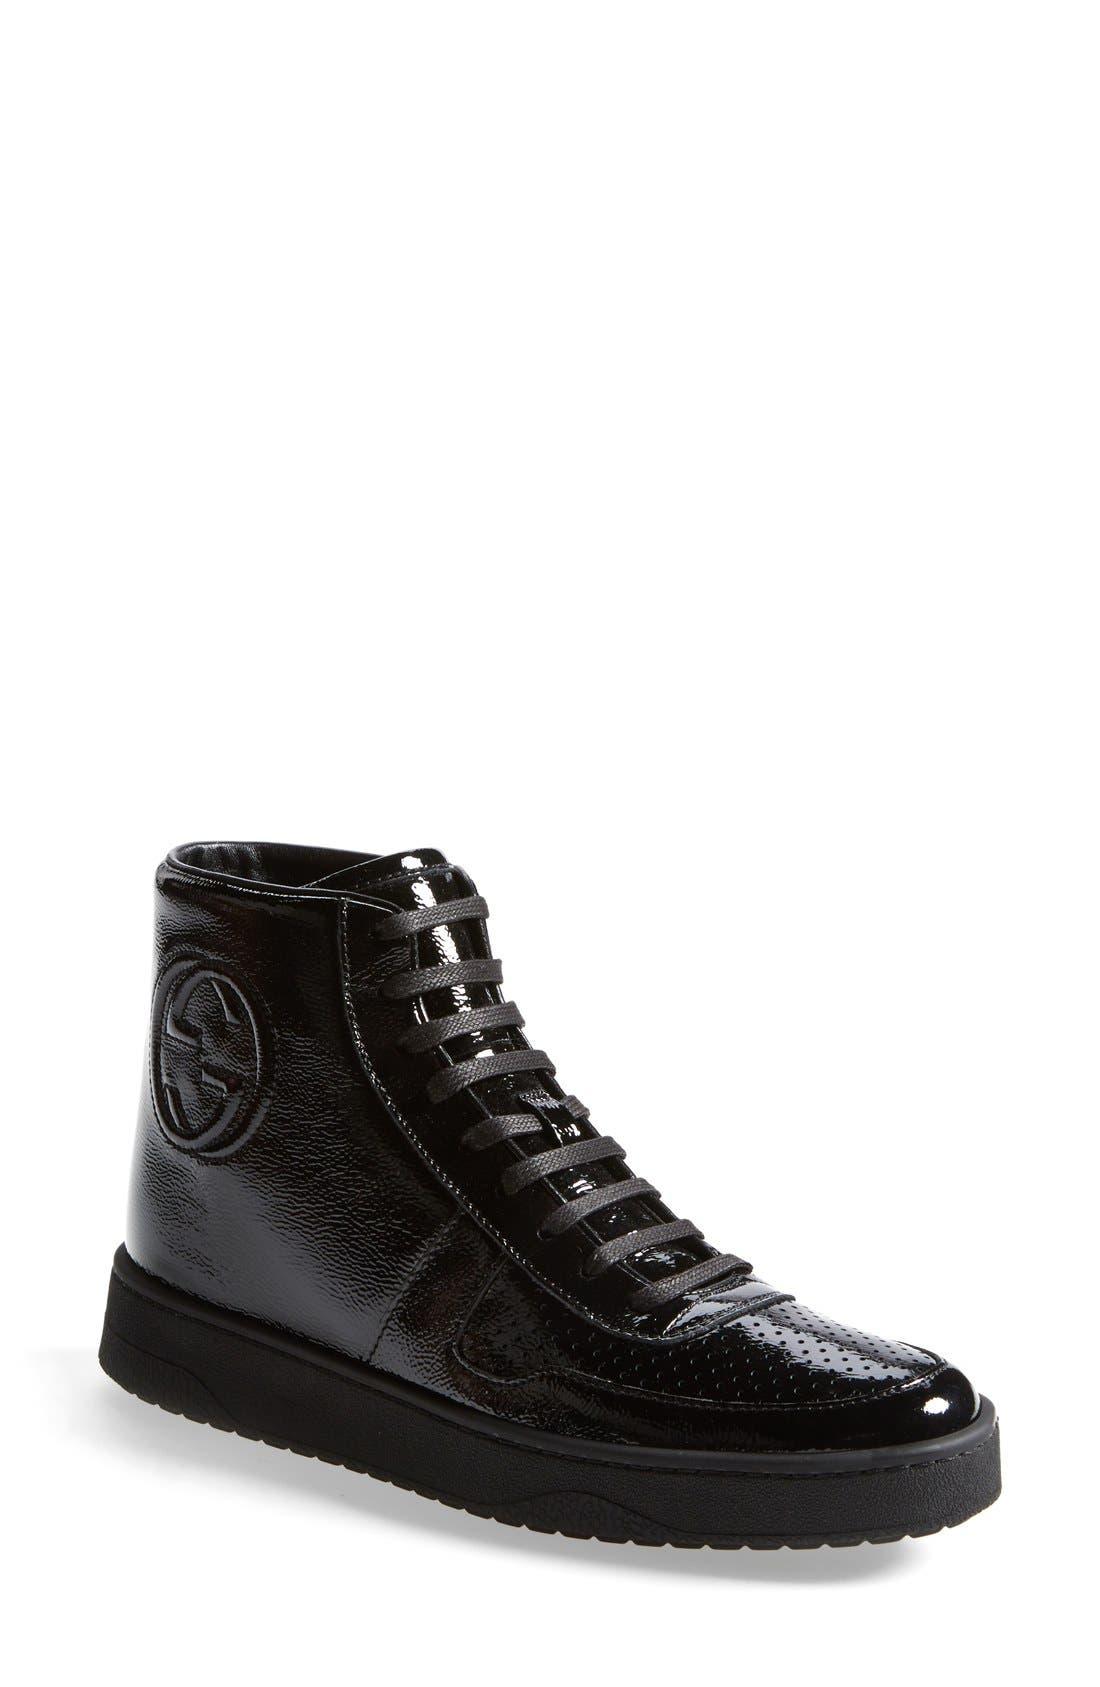 Alternate Image 1 Selected - Gucci 'Soho' High Top Sneaker (Women)